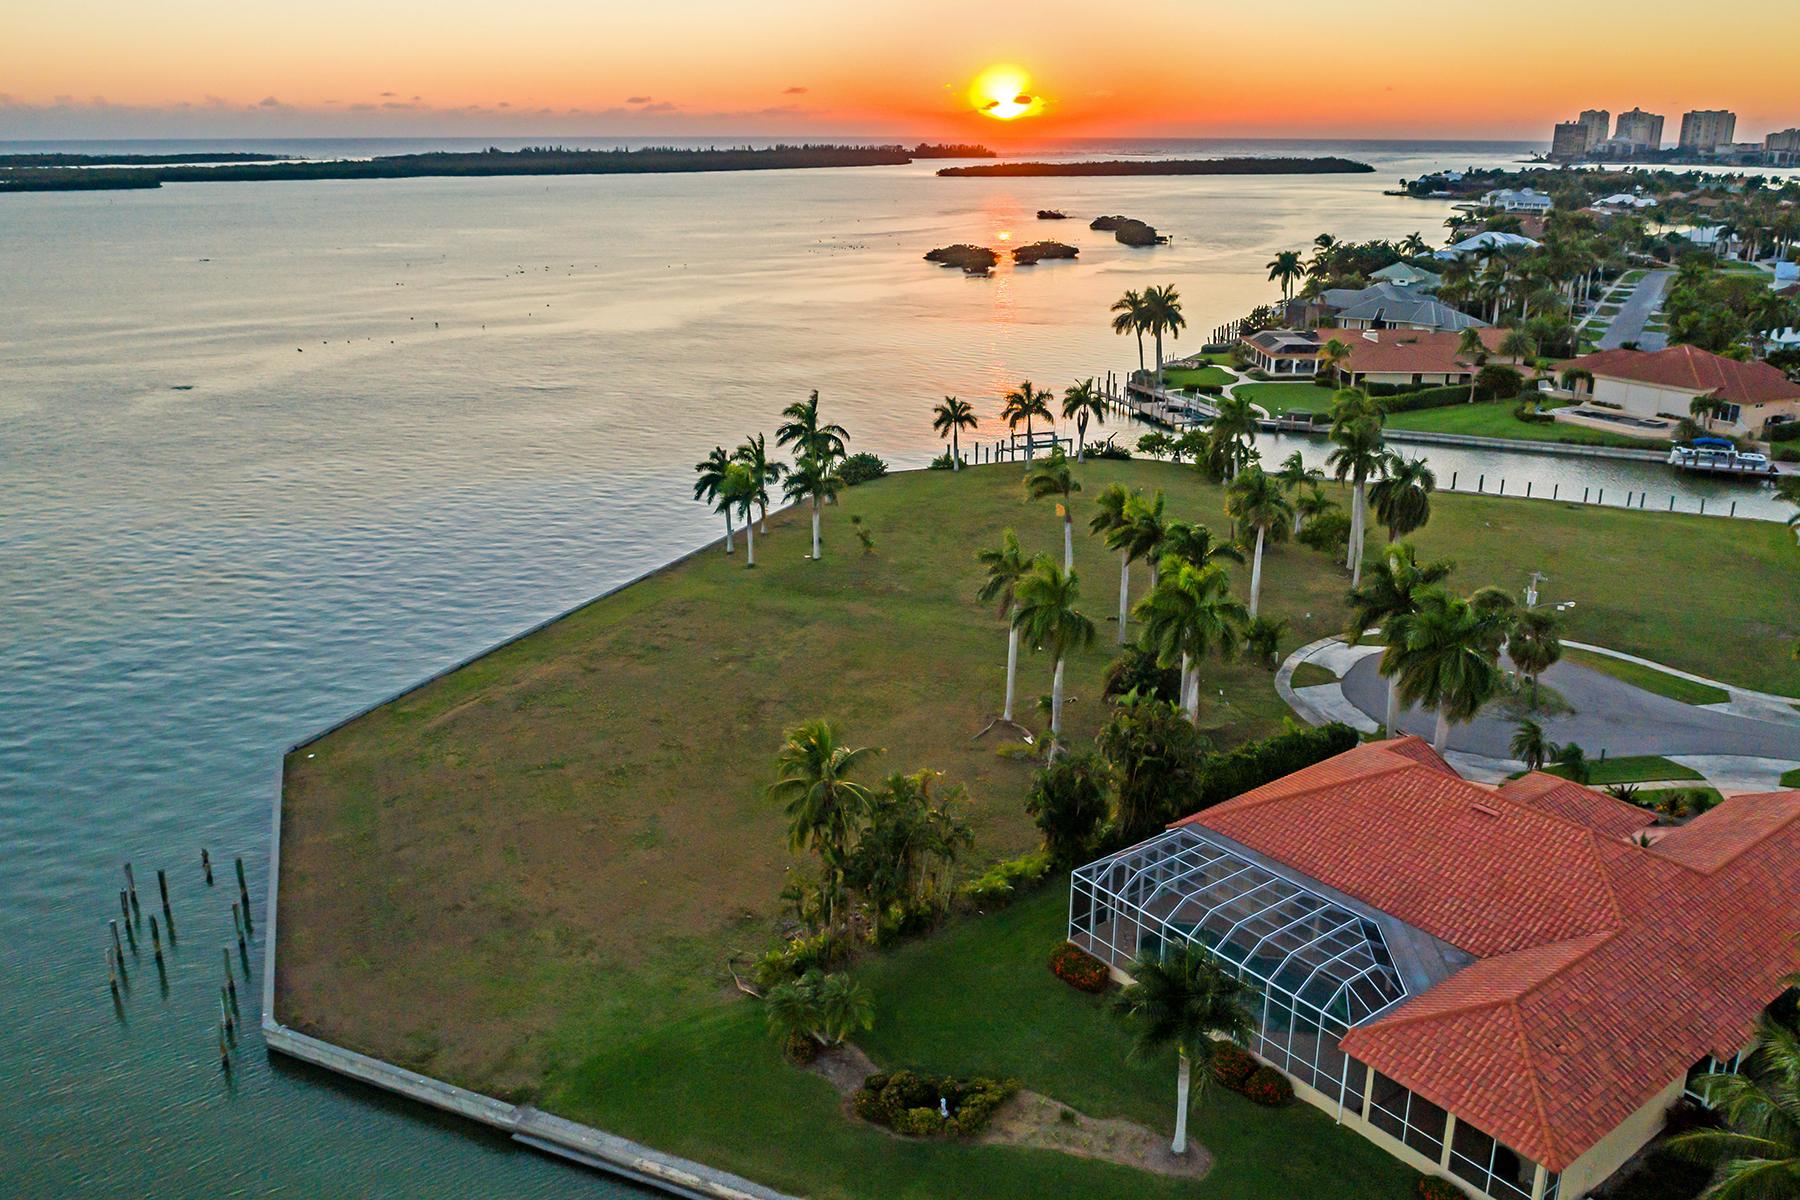 Land for Sale at MARCO ISLAND - ESTATES 991 Scott Drive Marco Island, Florida 34145 United States